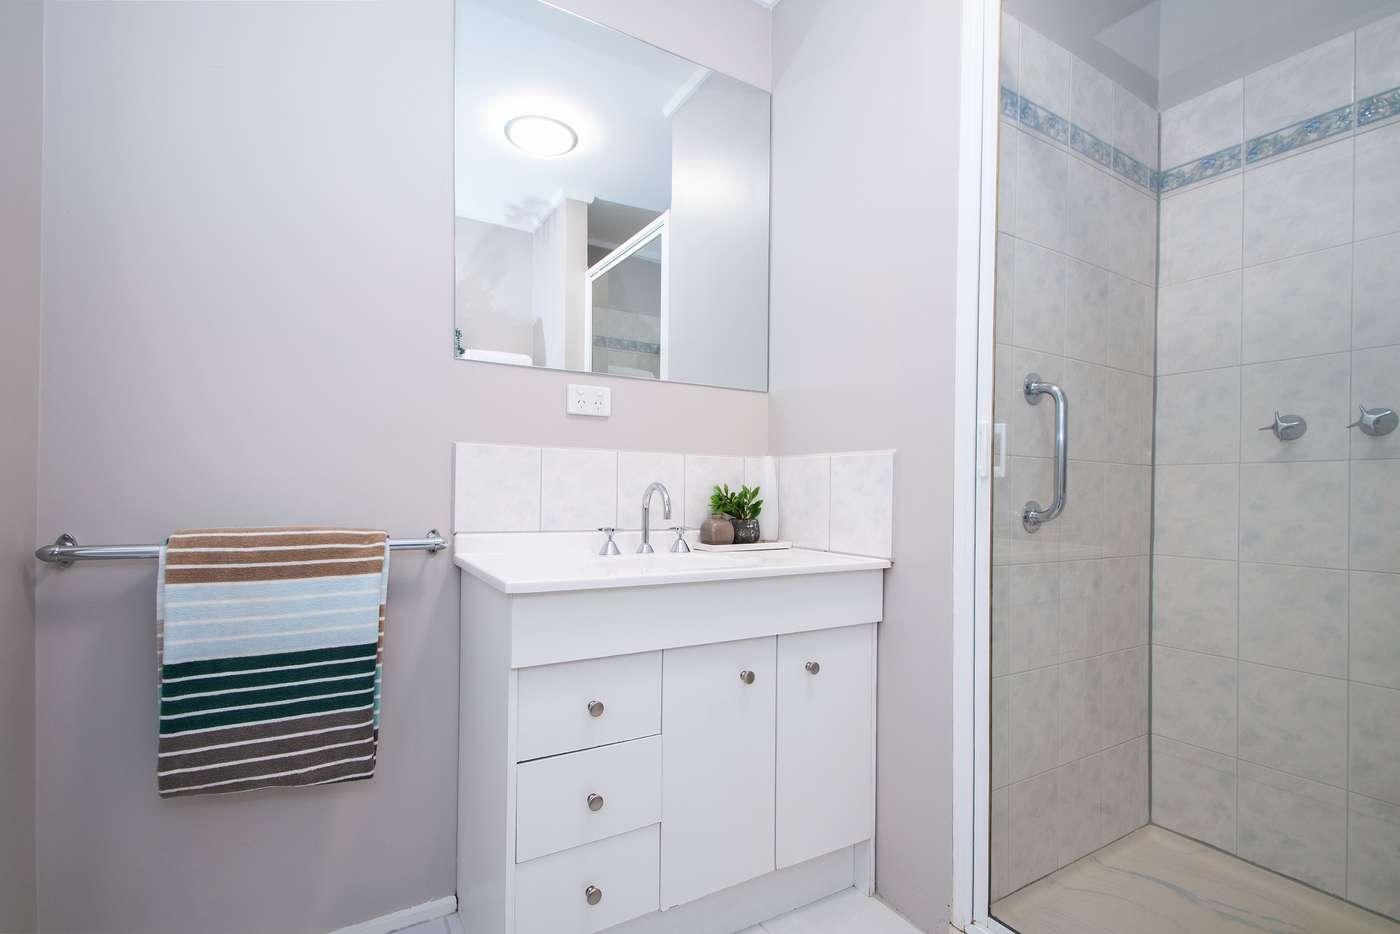 Sixth view of Homely unit listing, U12/8-12 Landale Avenue, Croydon VIC 3136